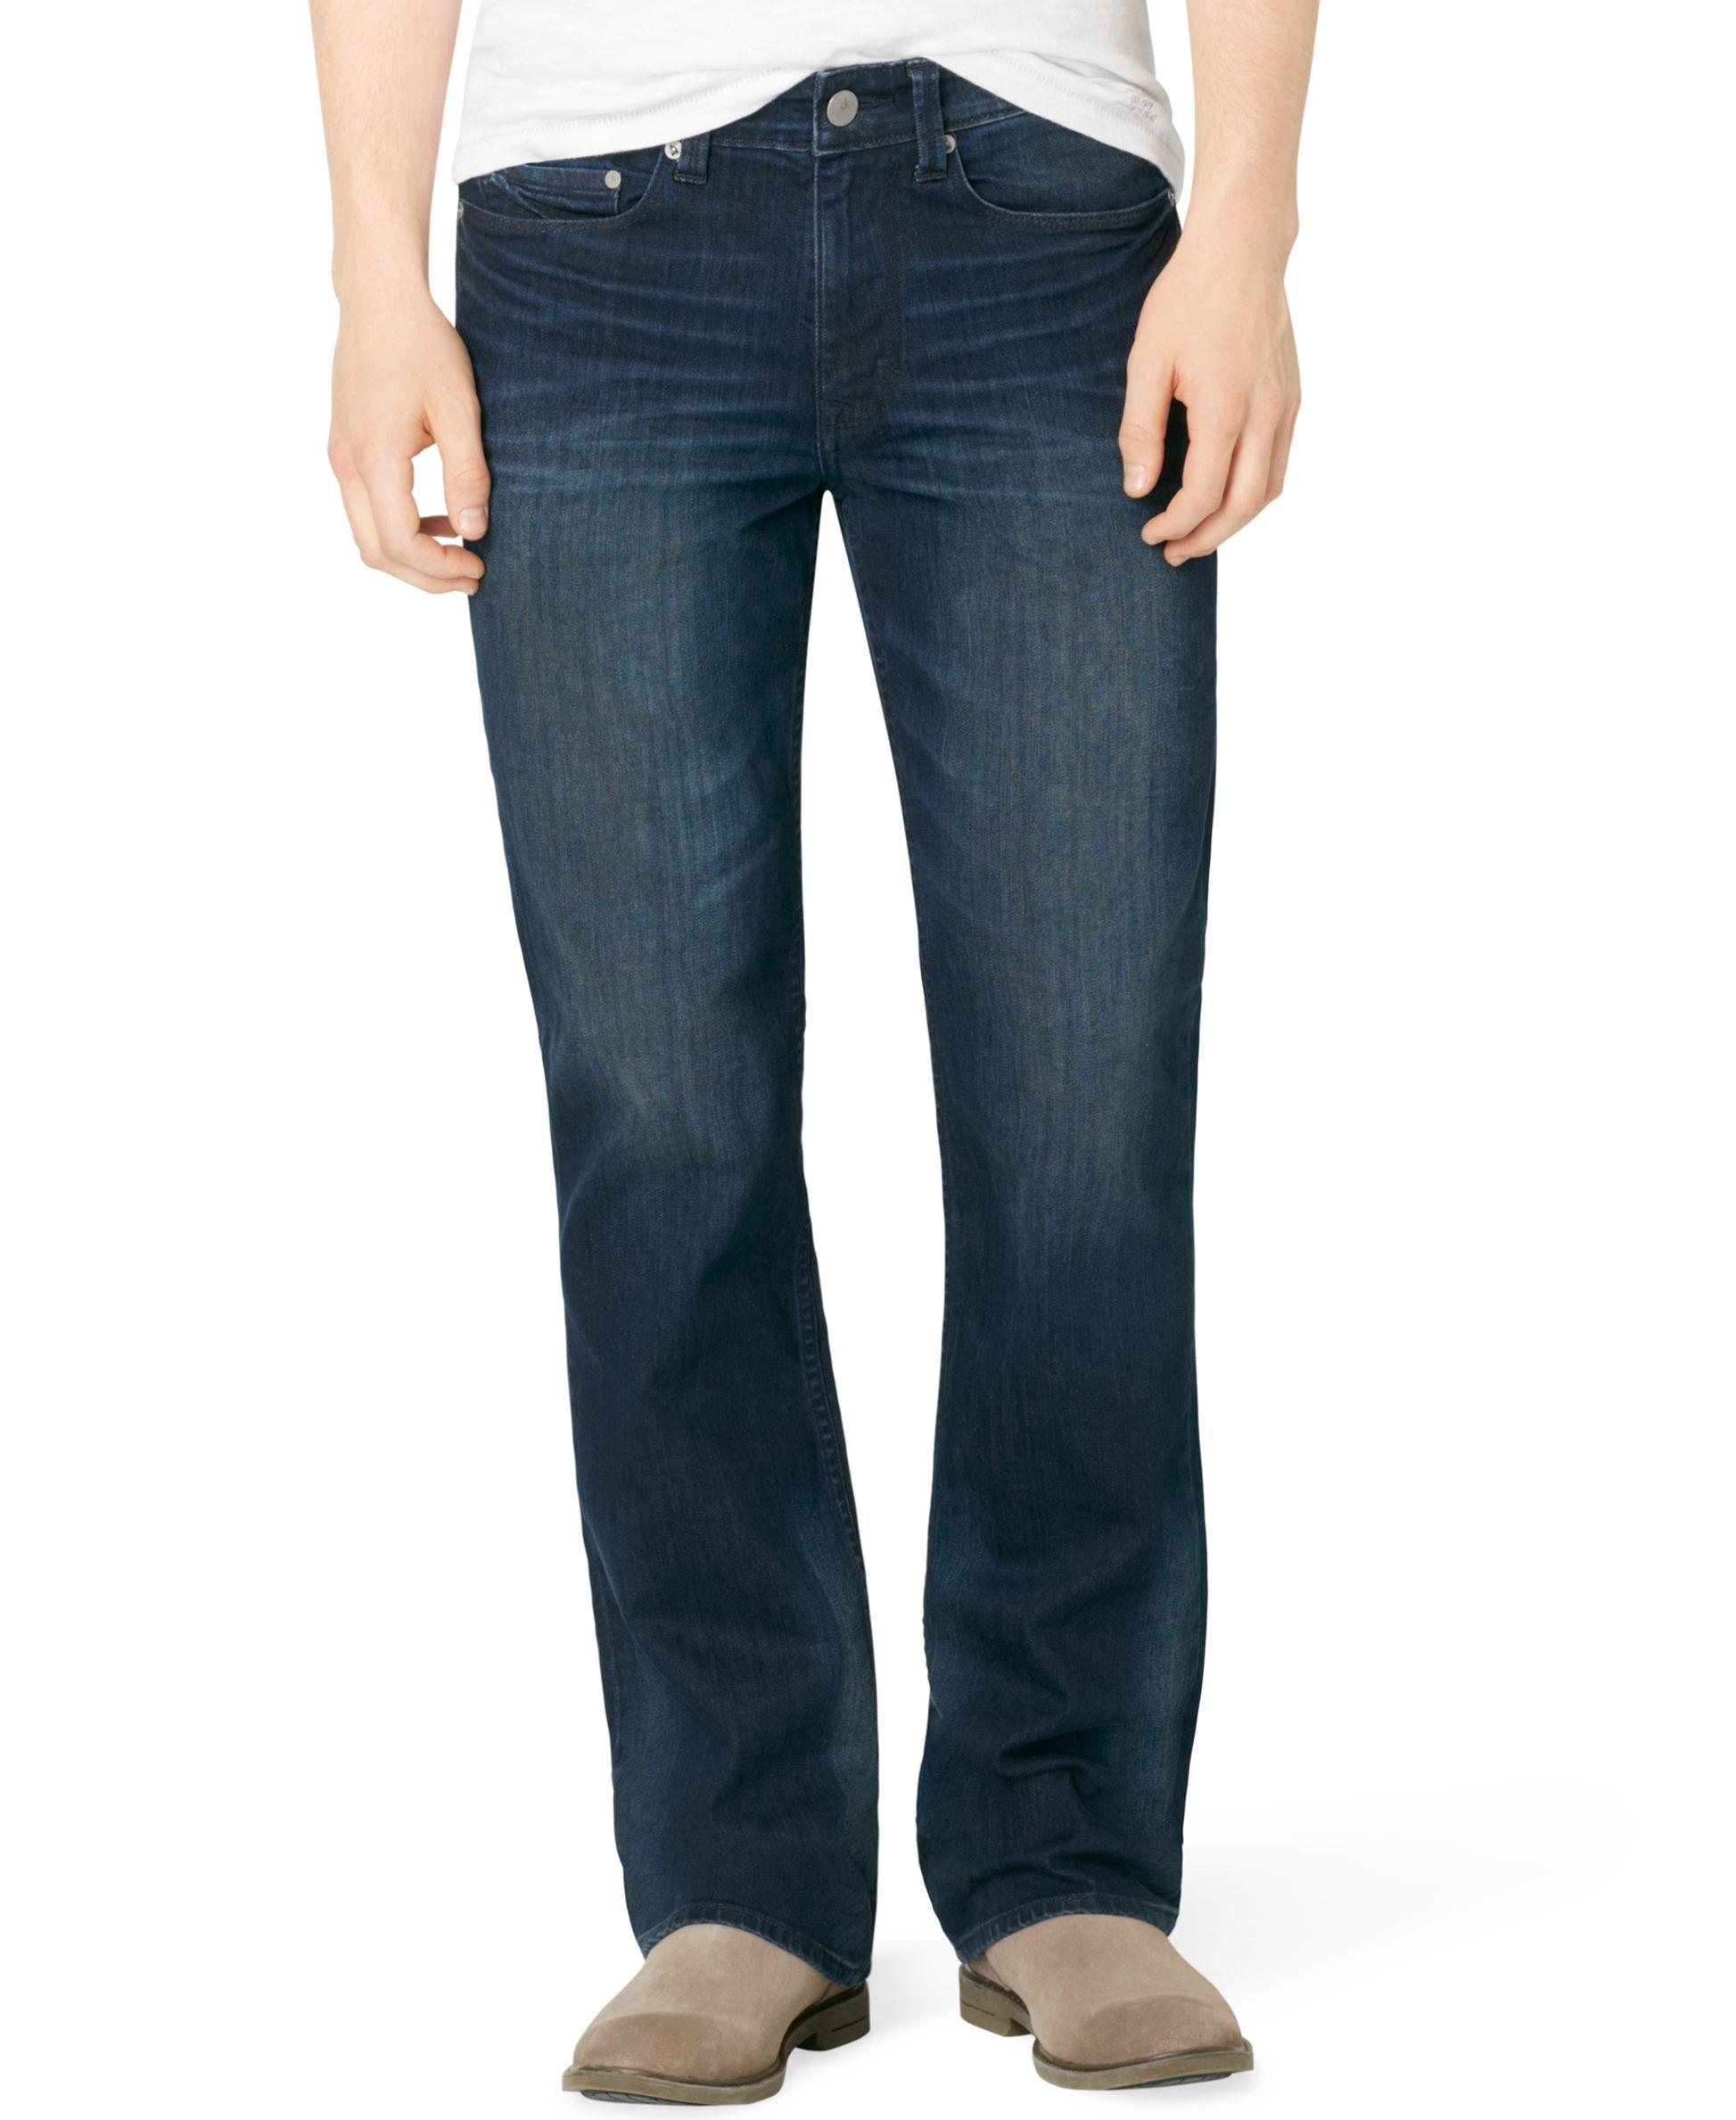 Mens bootcut jeans, Calvin klein jeans